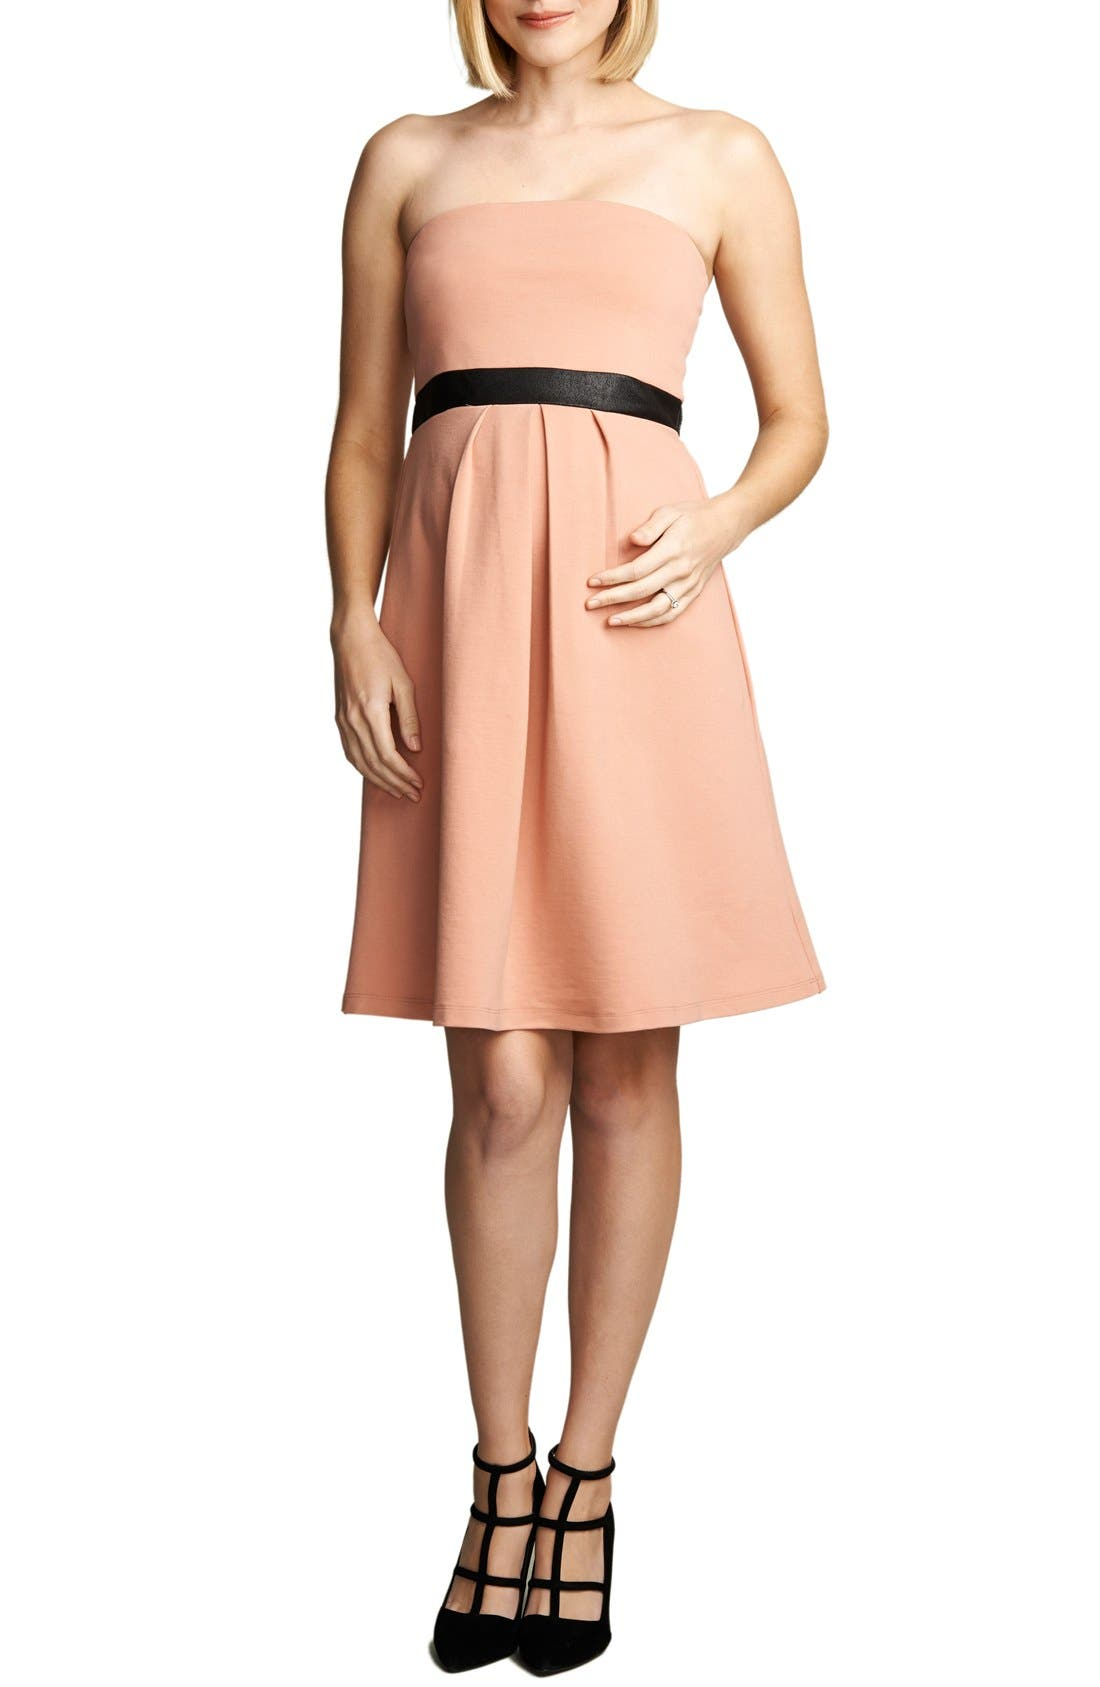 Strapless Maternity Dress,                         Main,                         color, Blush/ Black